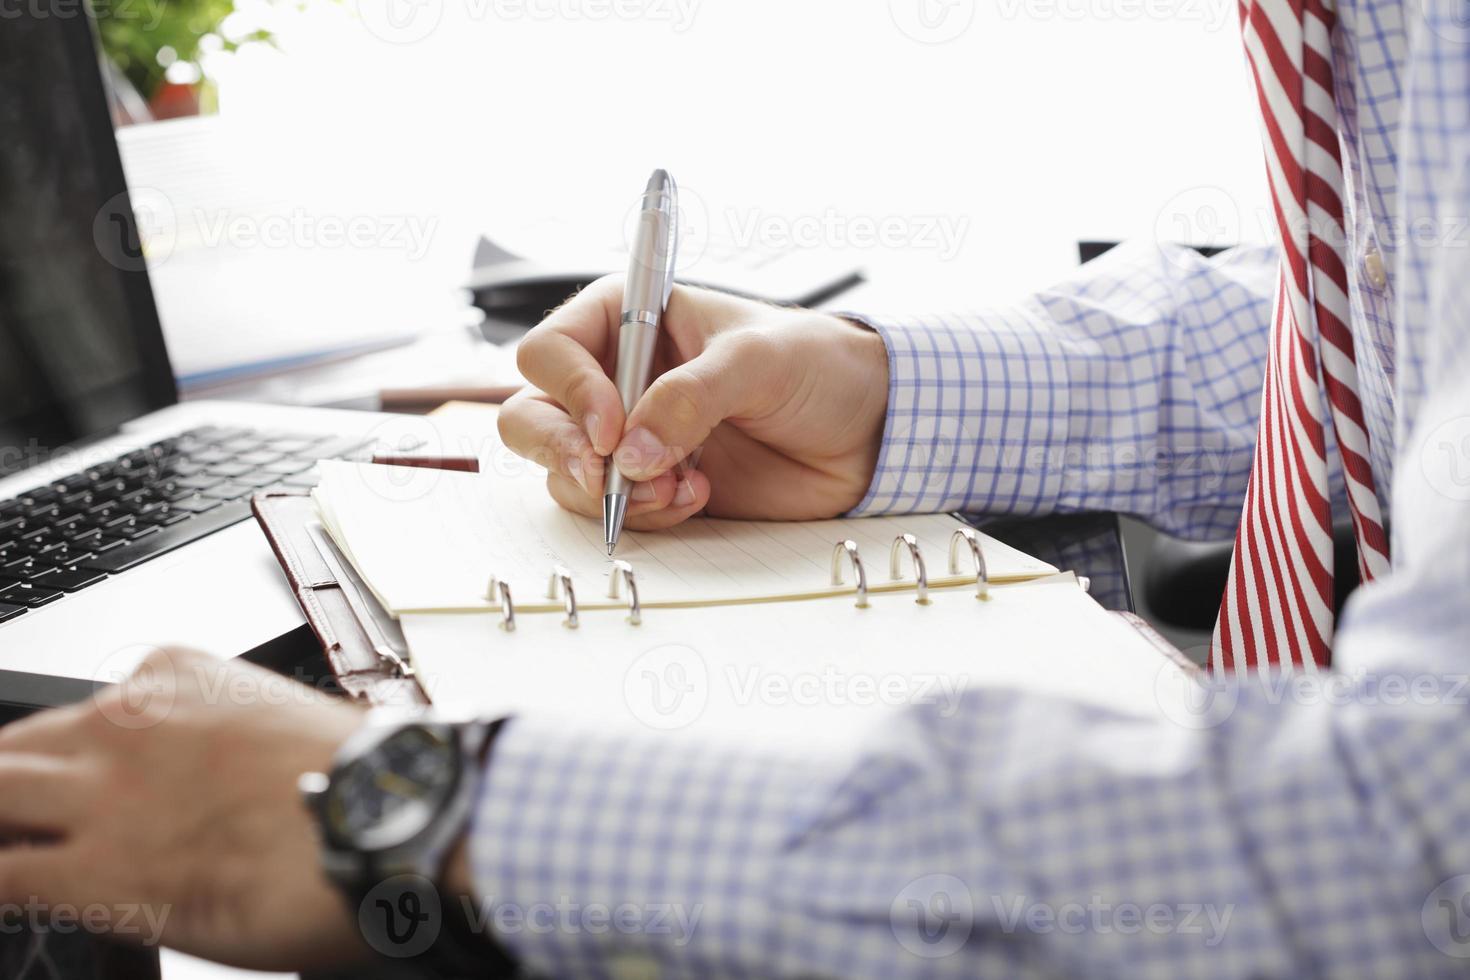 A man writing in his personal calendar photo